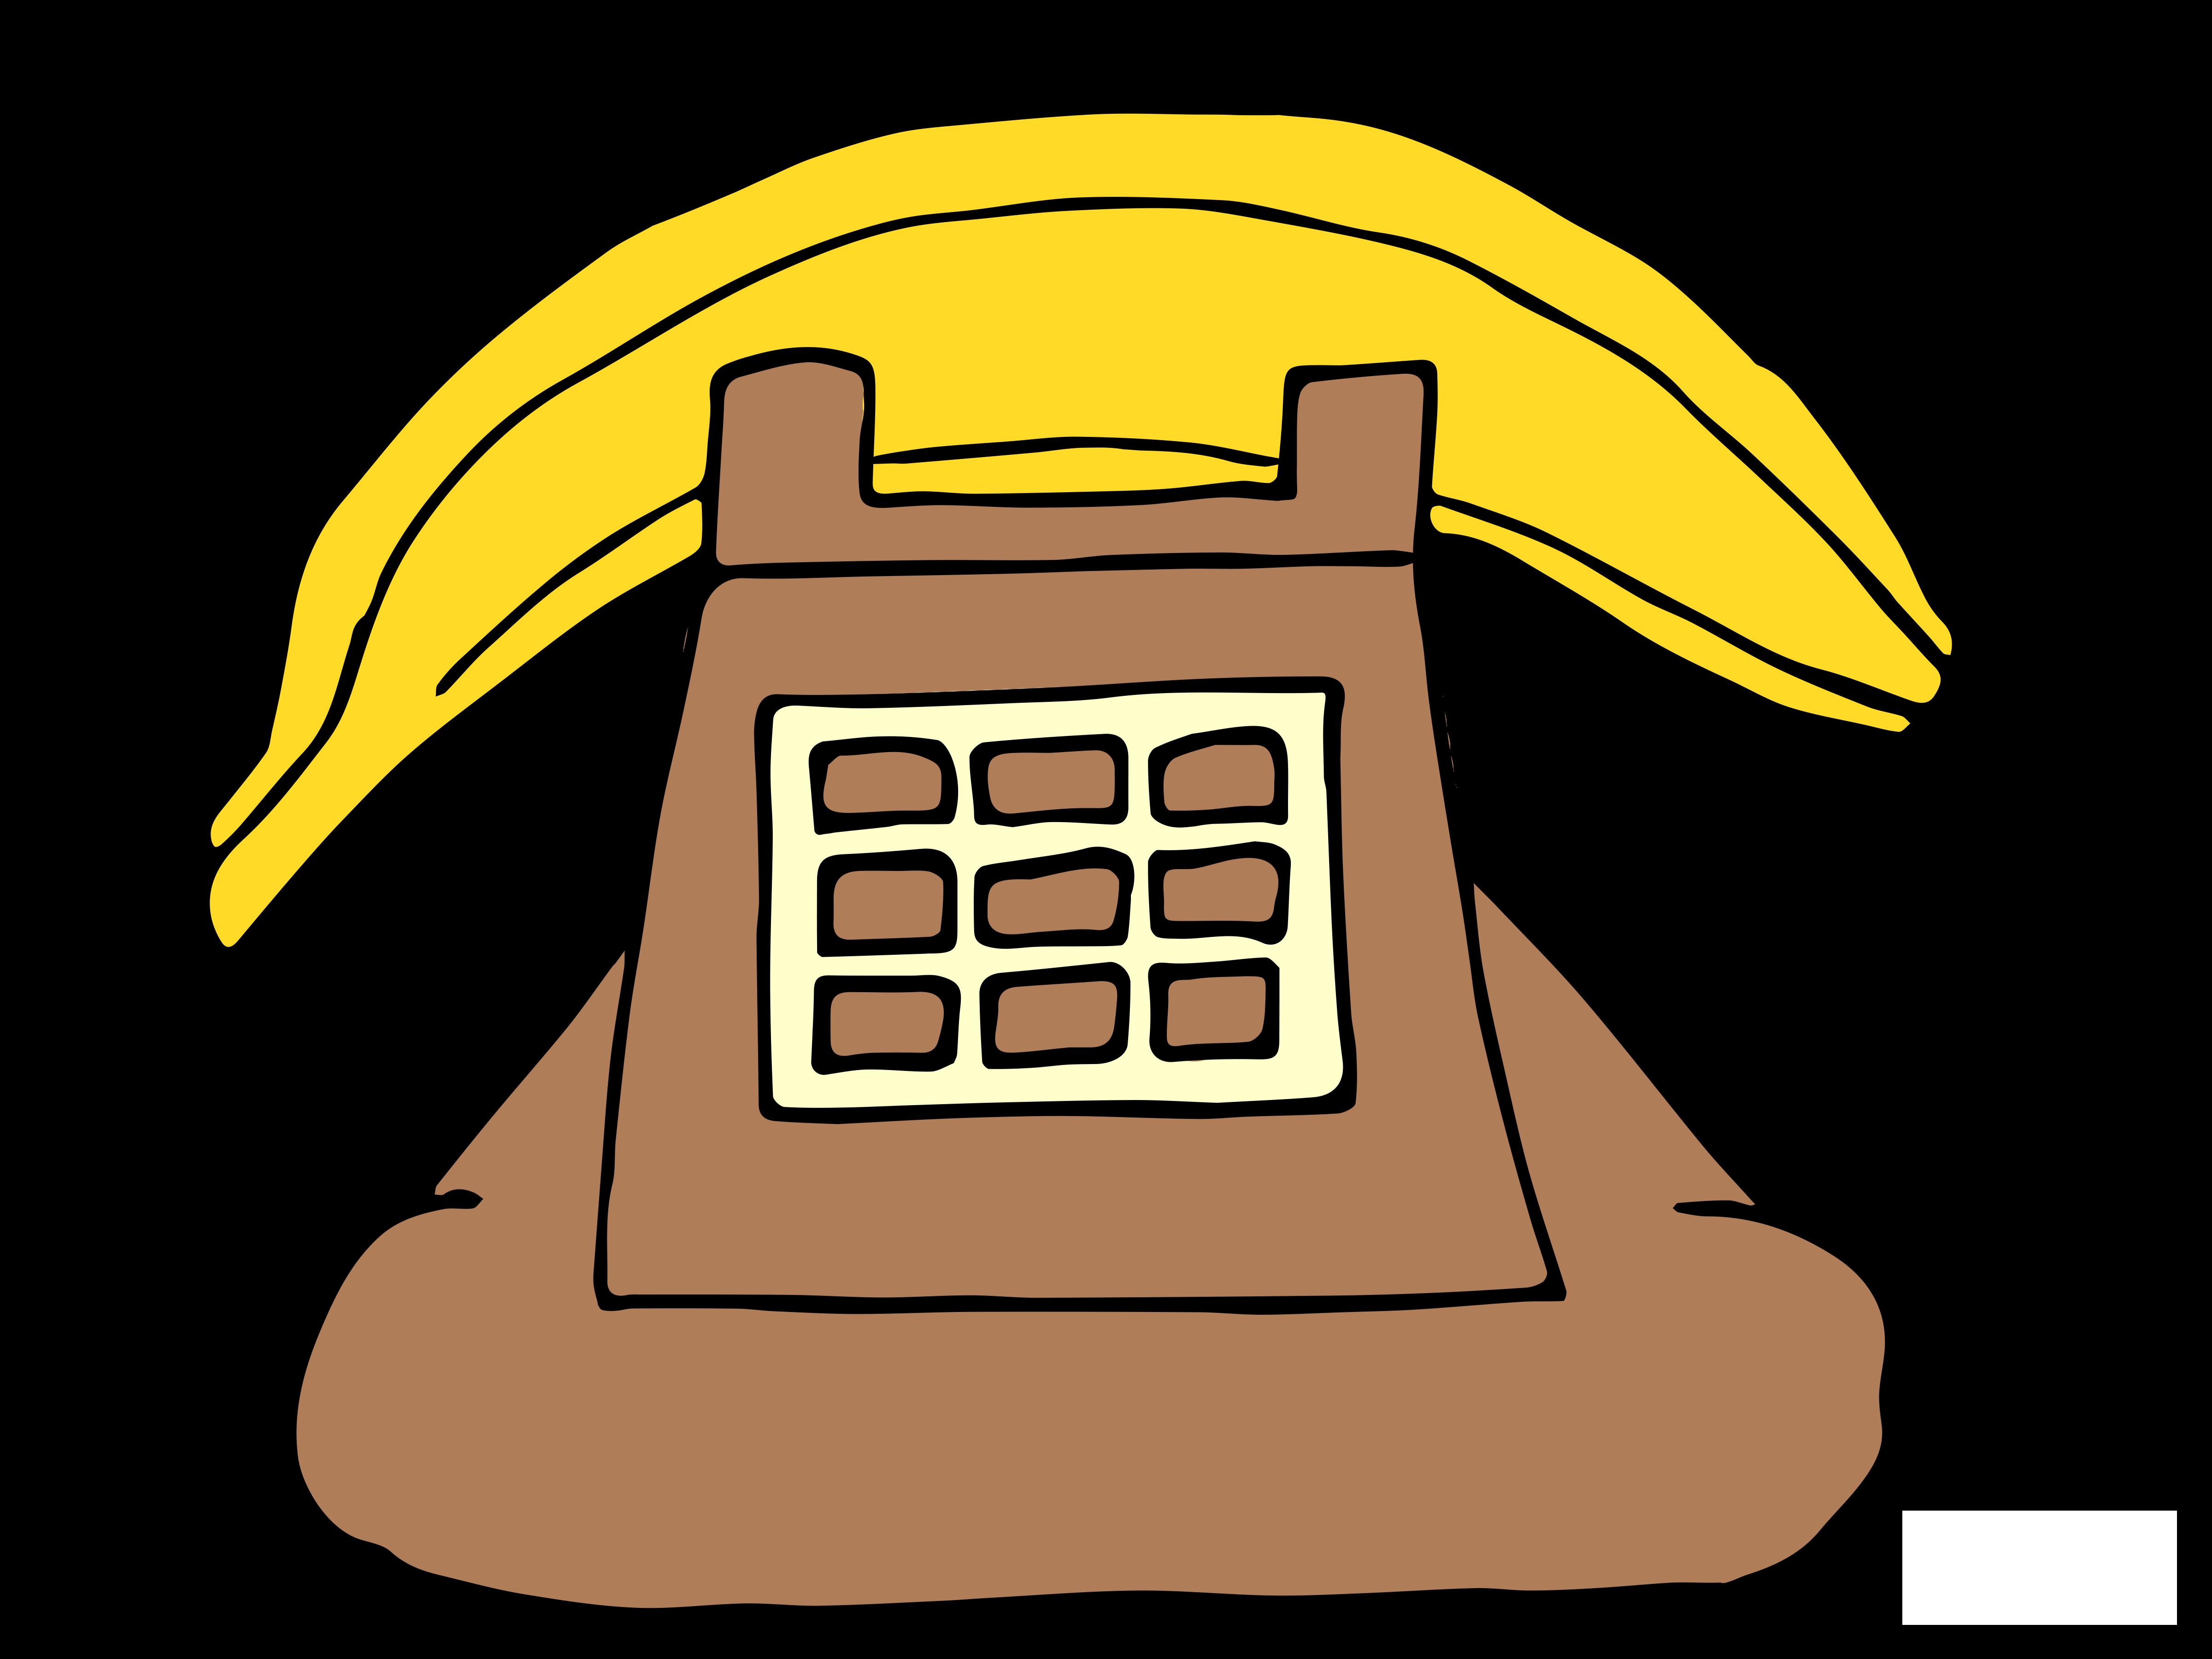 Camp . Clipart telephone yellow telephone